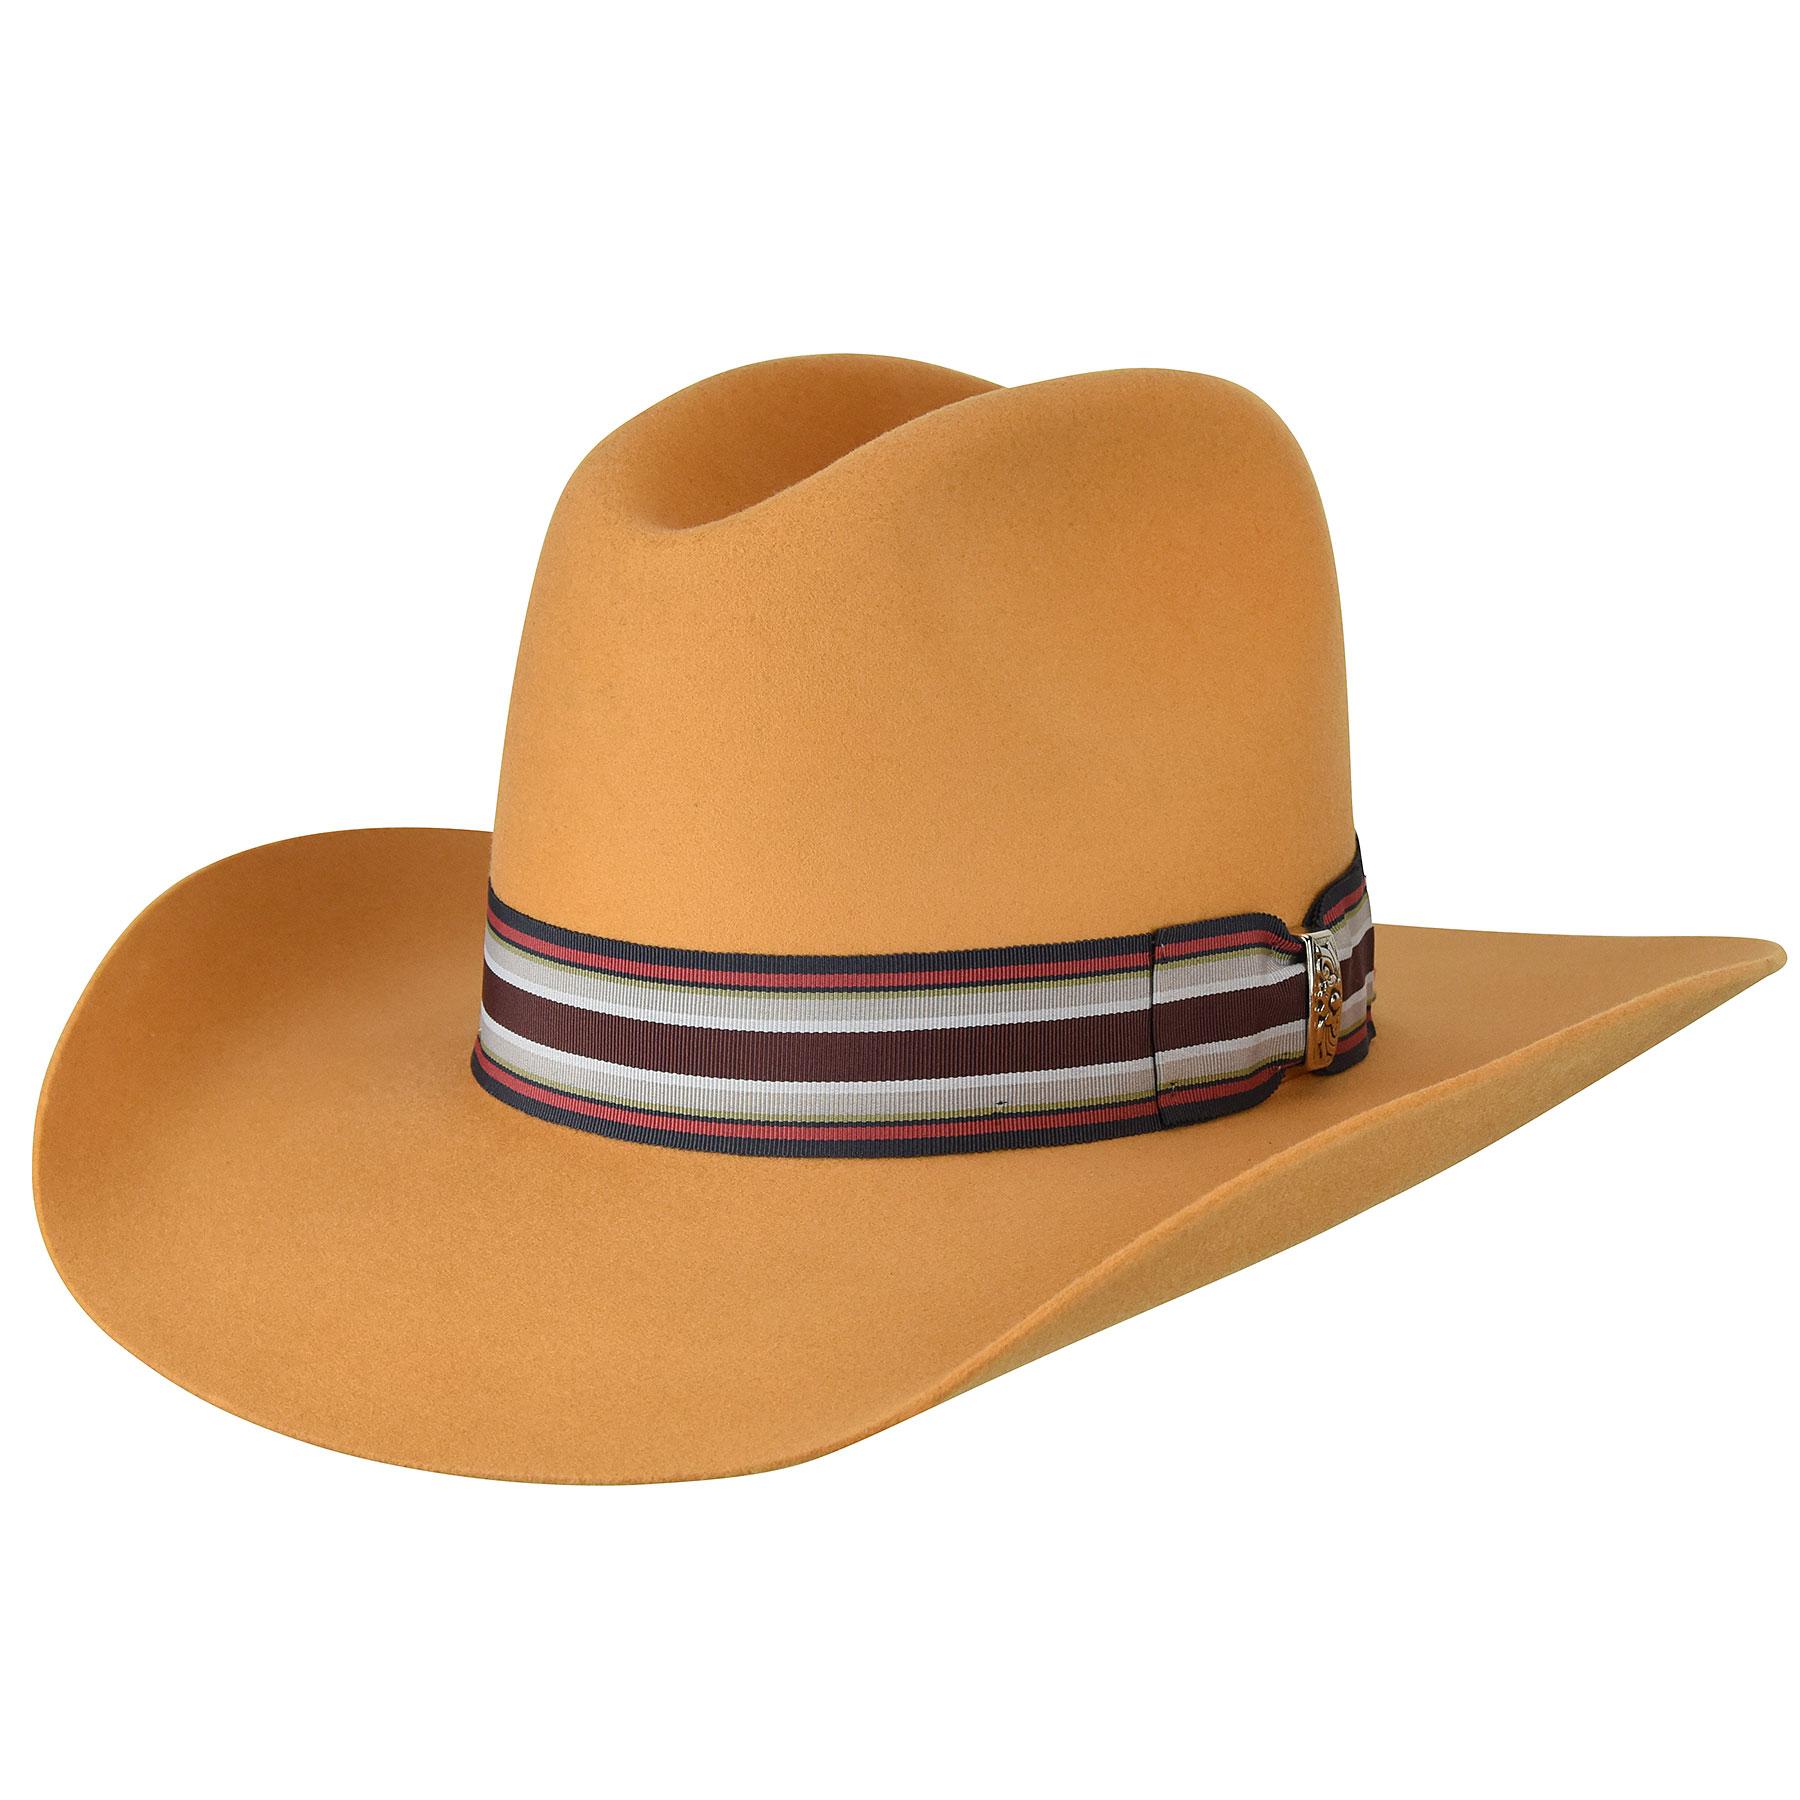 Renegade Renegade Bent Western Hat in Wheat